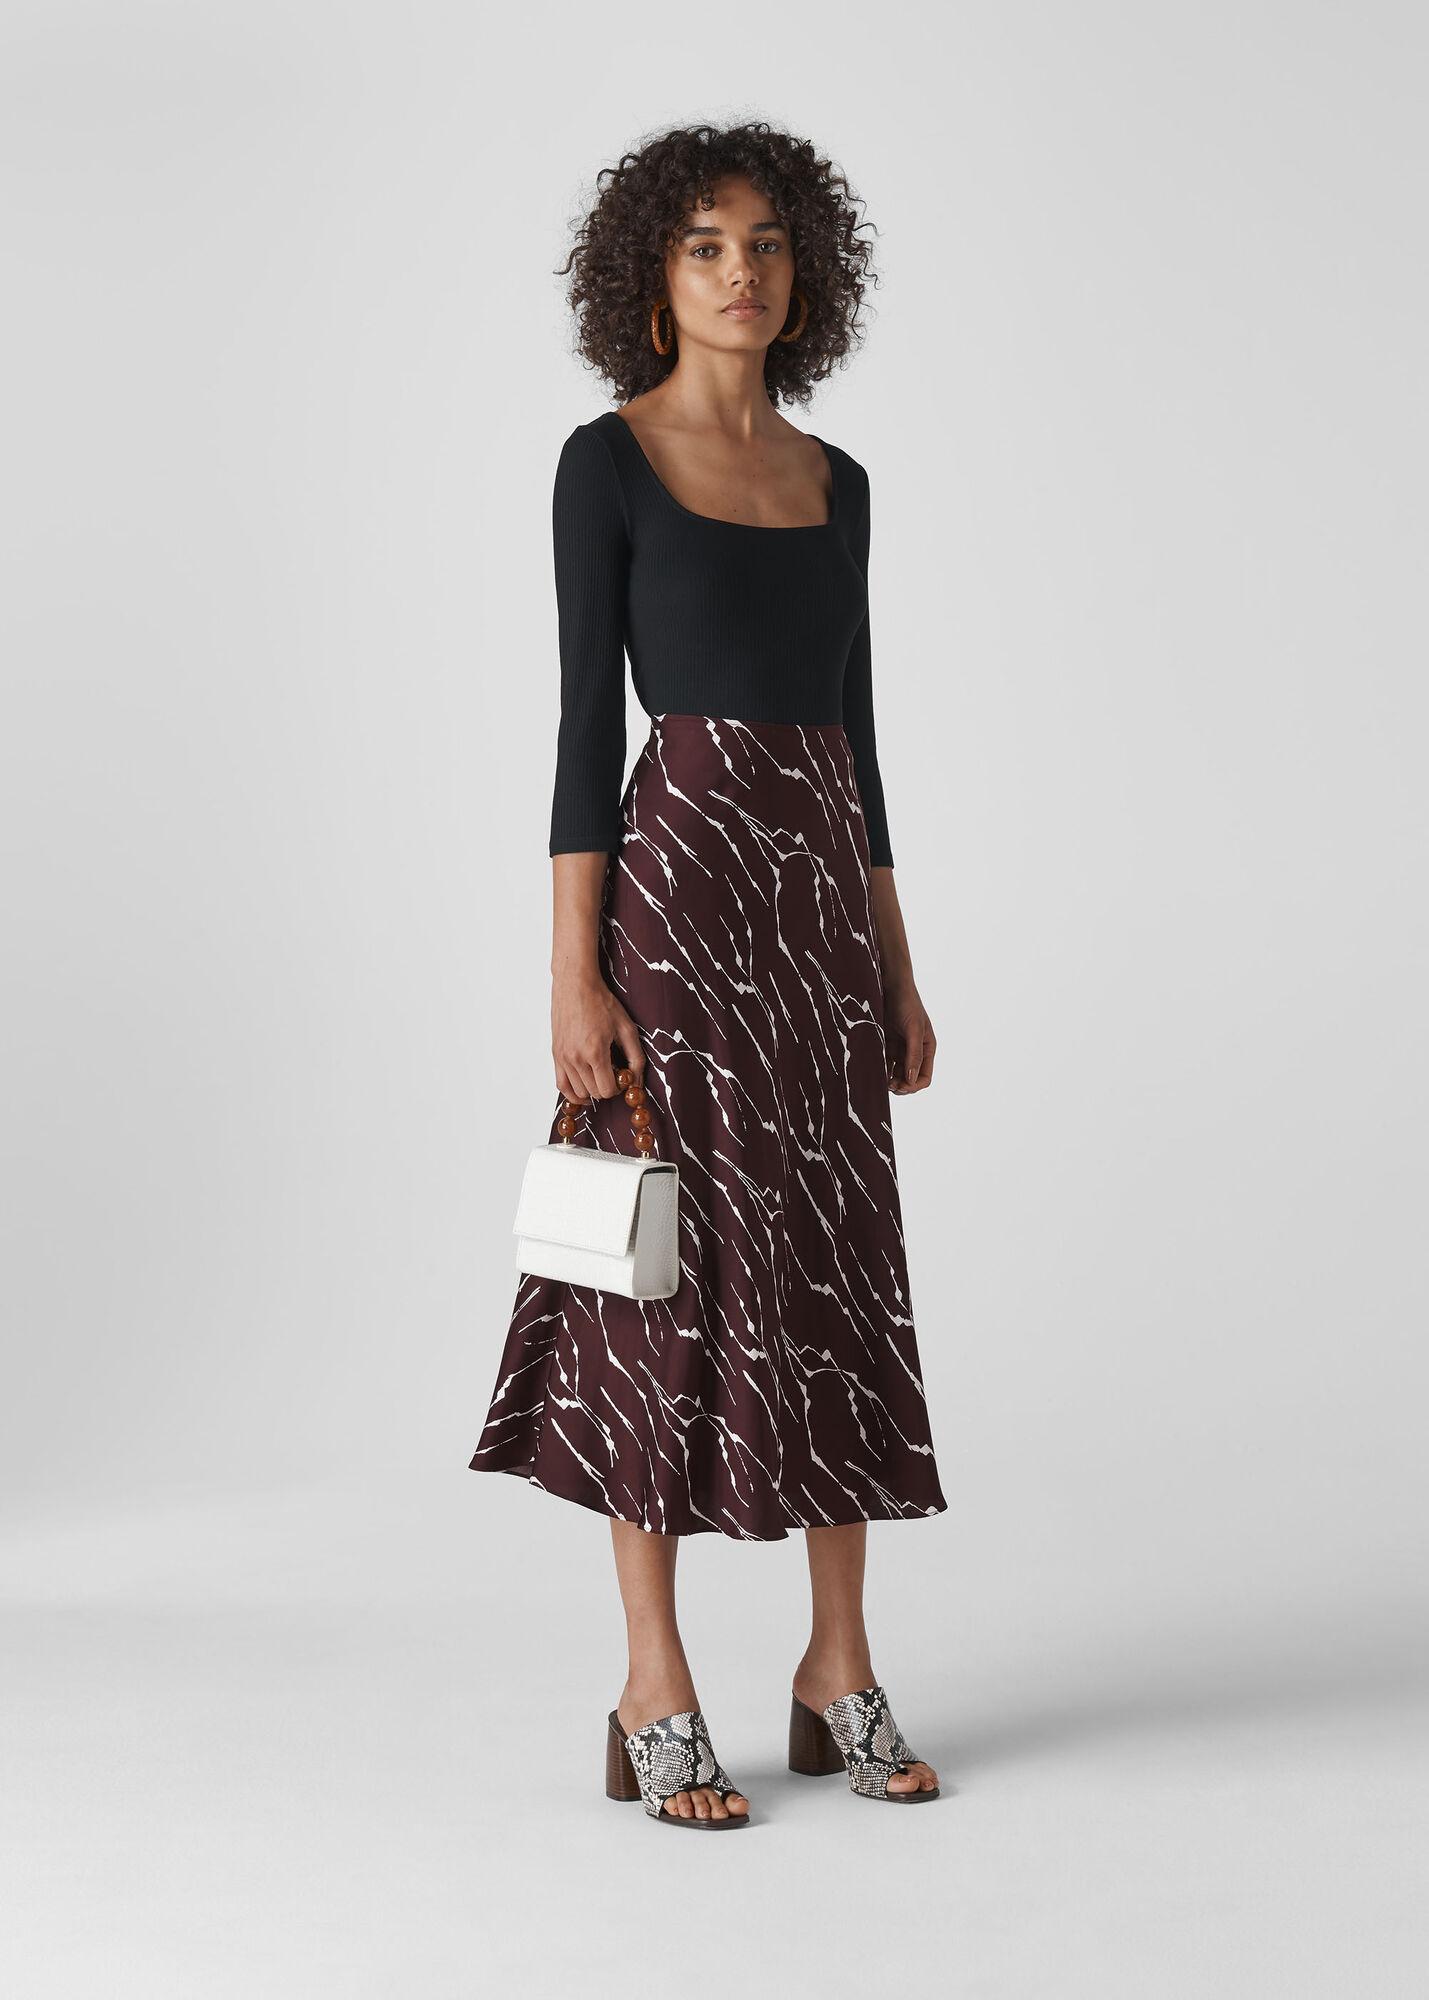 Twig Print Bias Cut Skirt